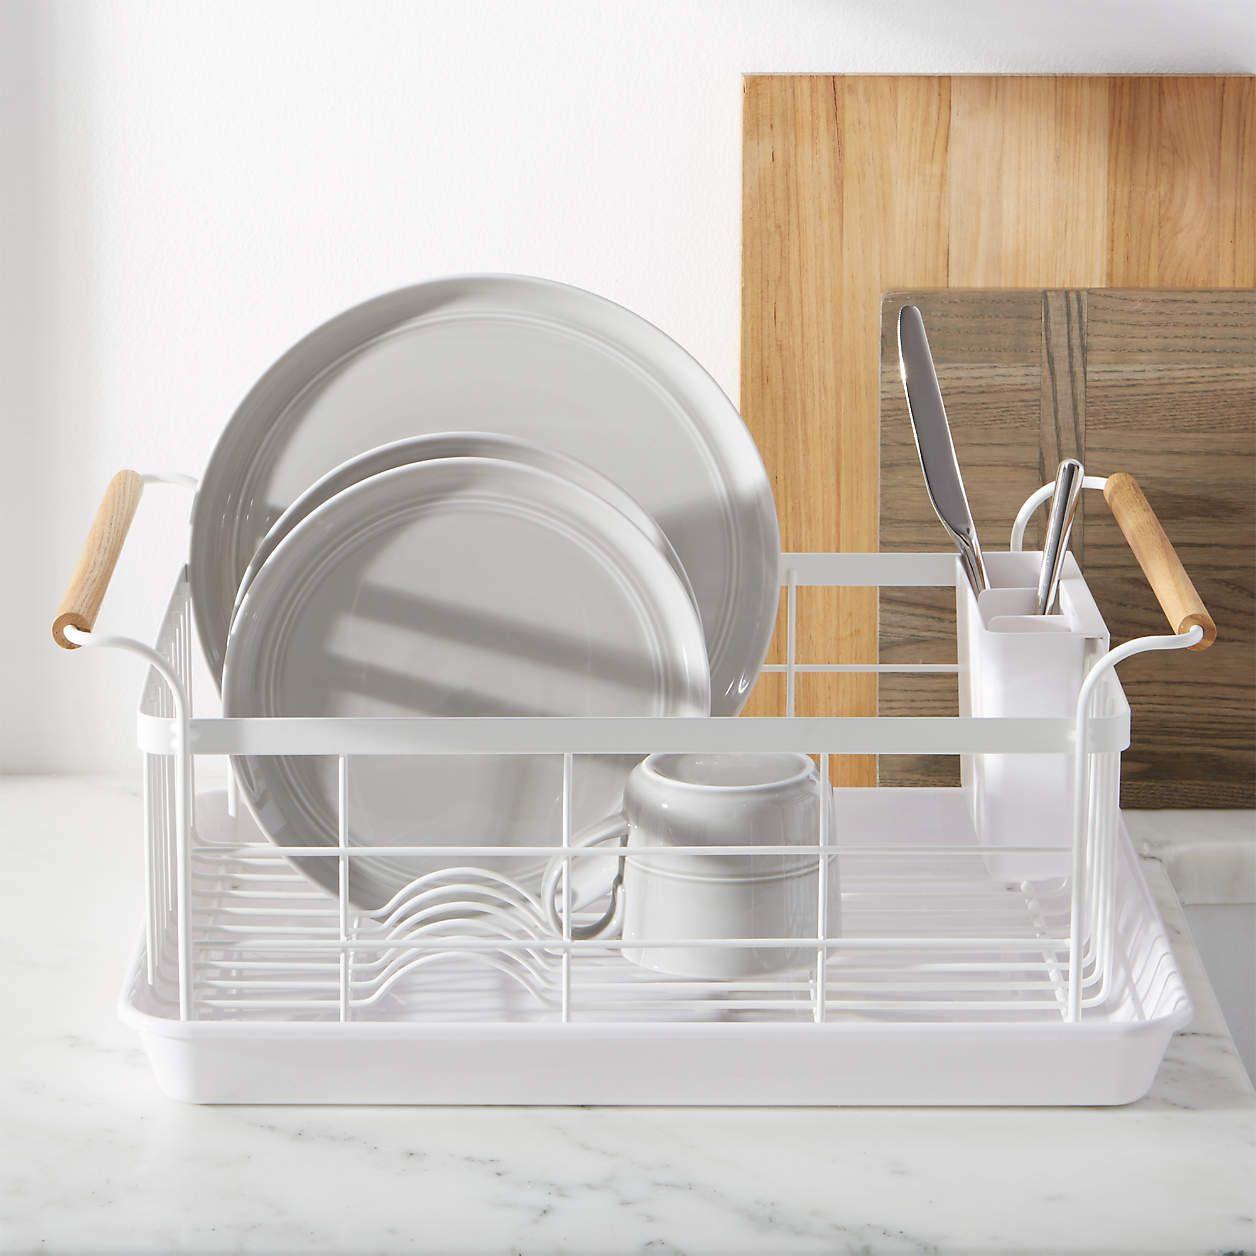 Yamazaki Home Wood-Handled Dish Rack